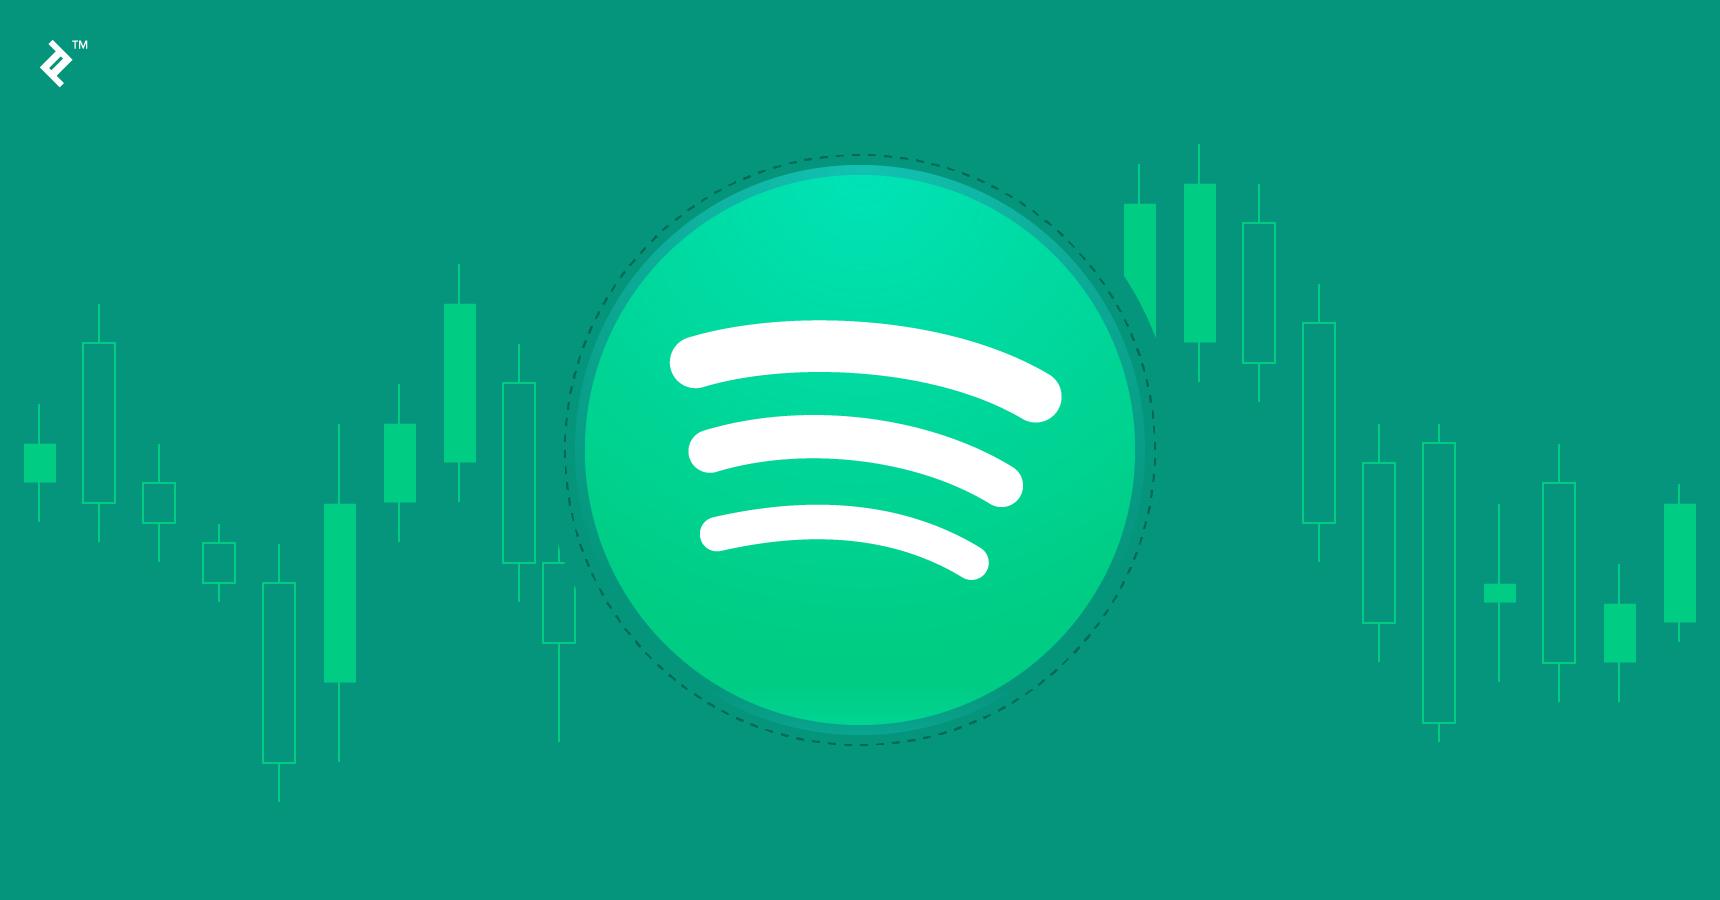 Spotify stock